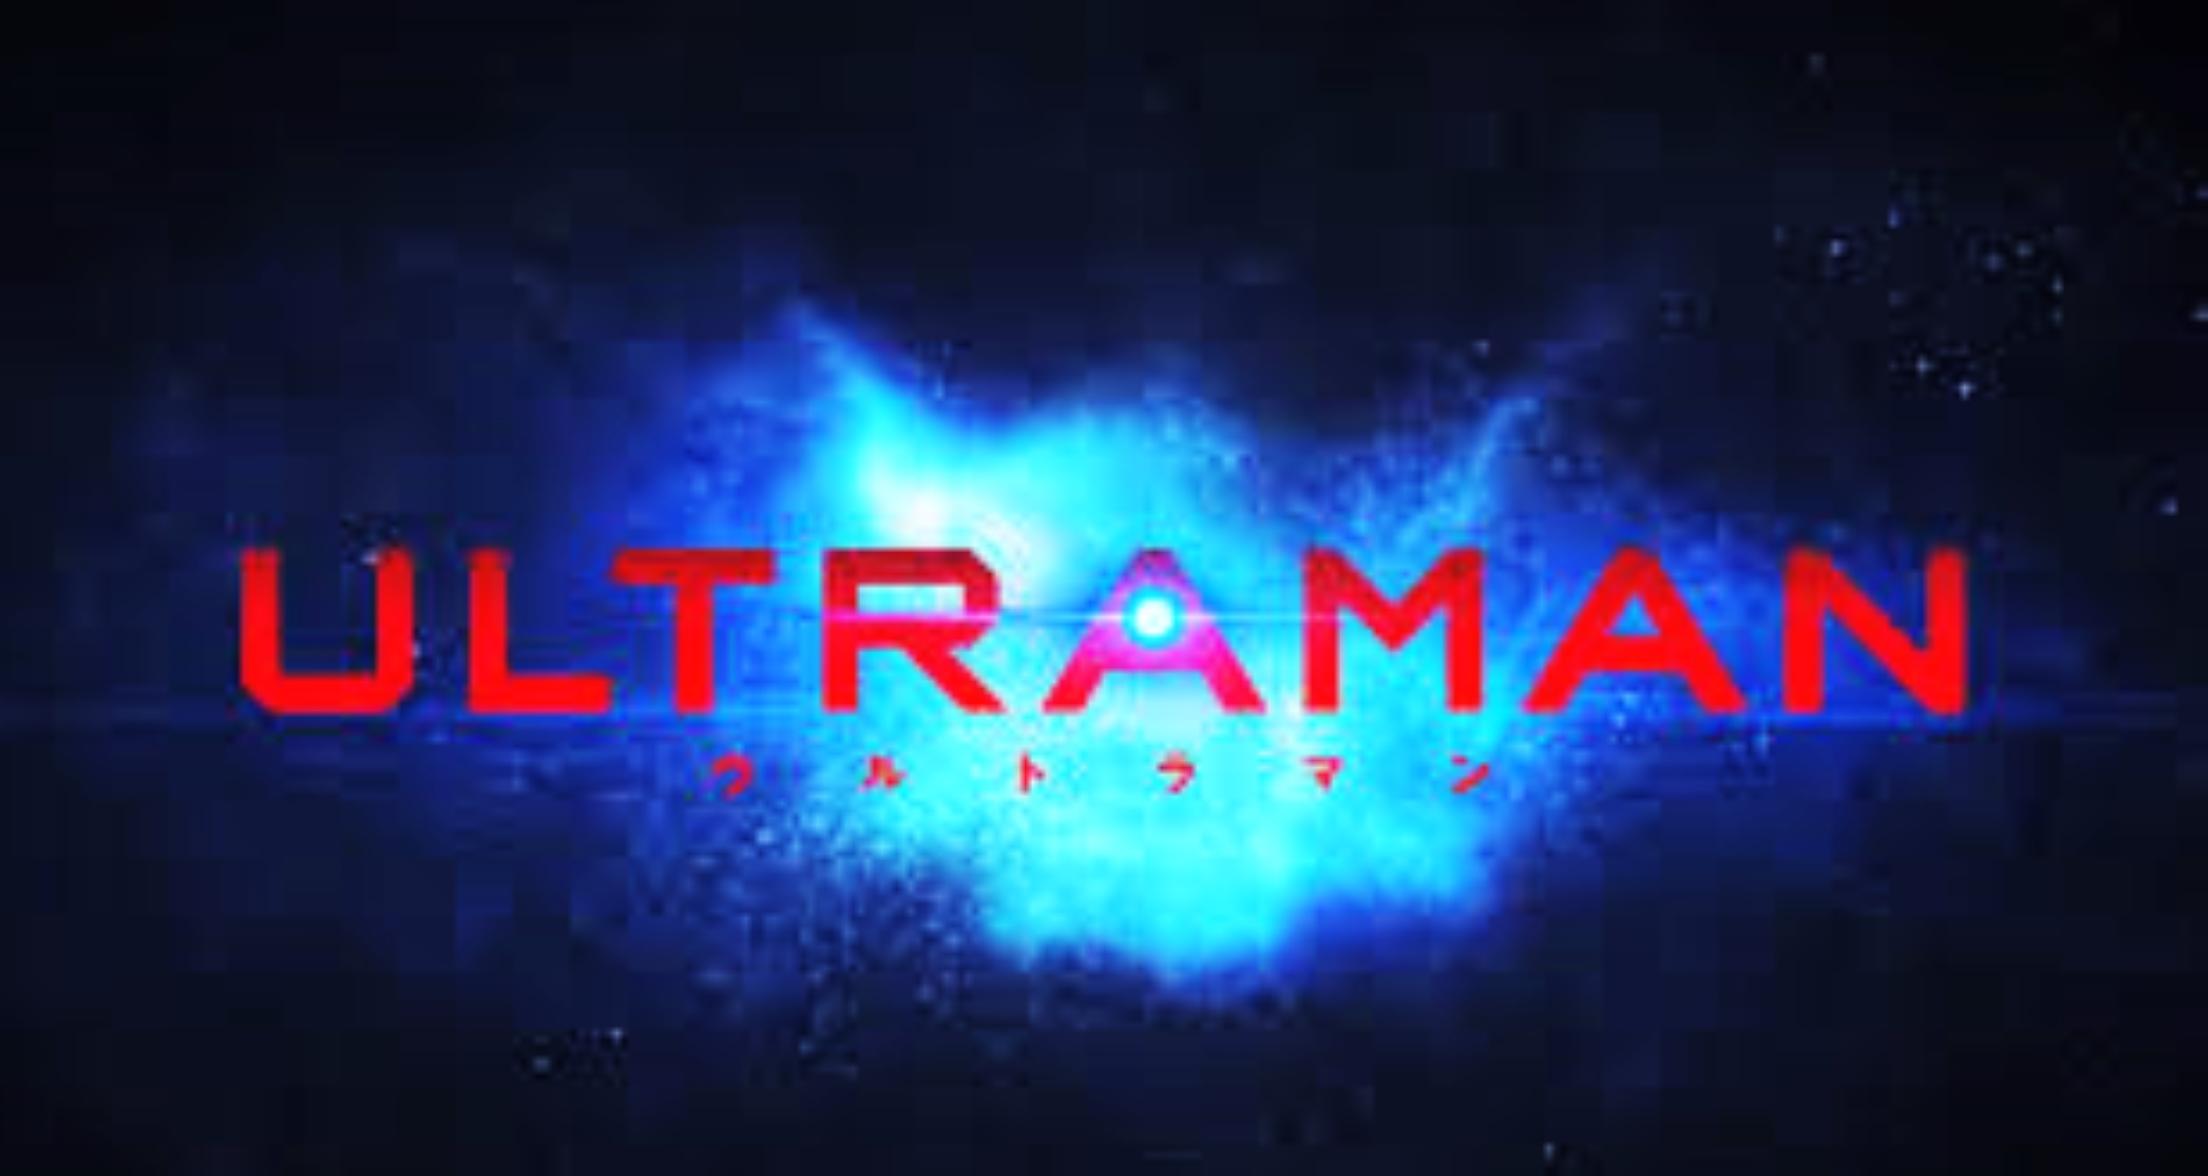 Ultraman Netflix Logo.Black Backgound.545 KB.jpg